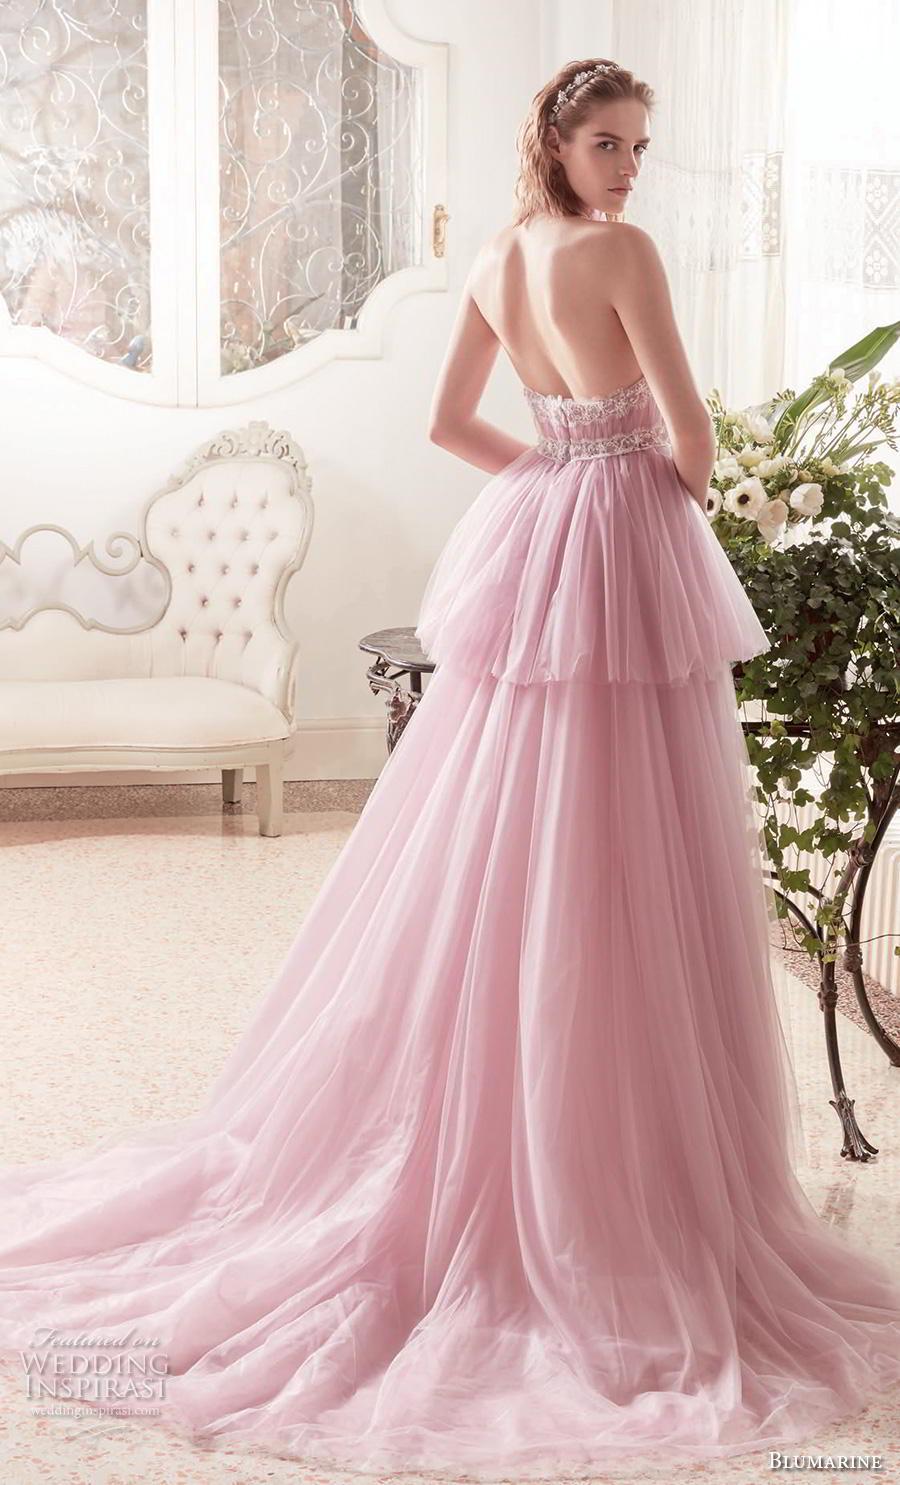 blumarine sposa 2019 bridal sleeveless halter neck ruched bodice tiered skirt romantic pink a  line wedding dress backless medium train (17) bv